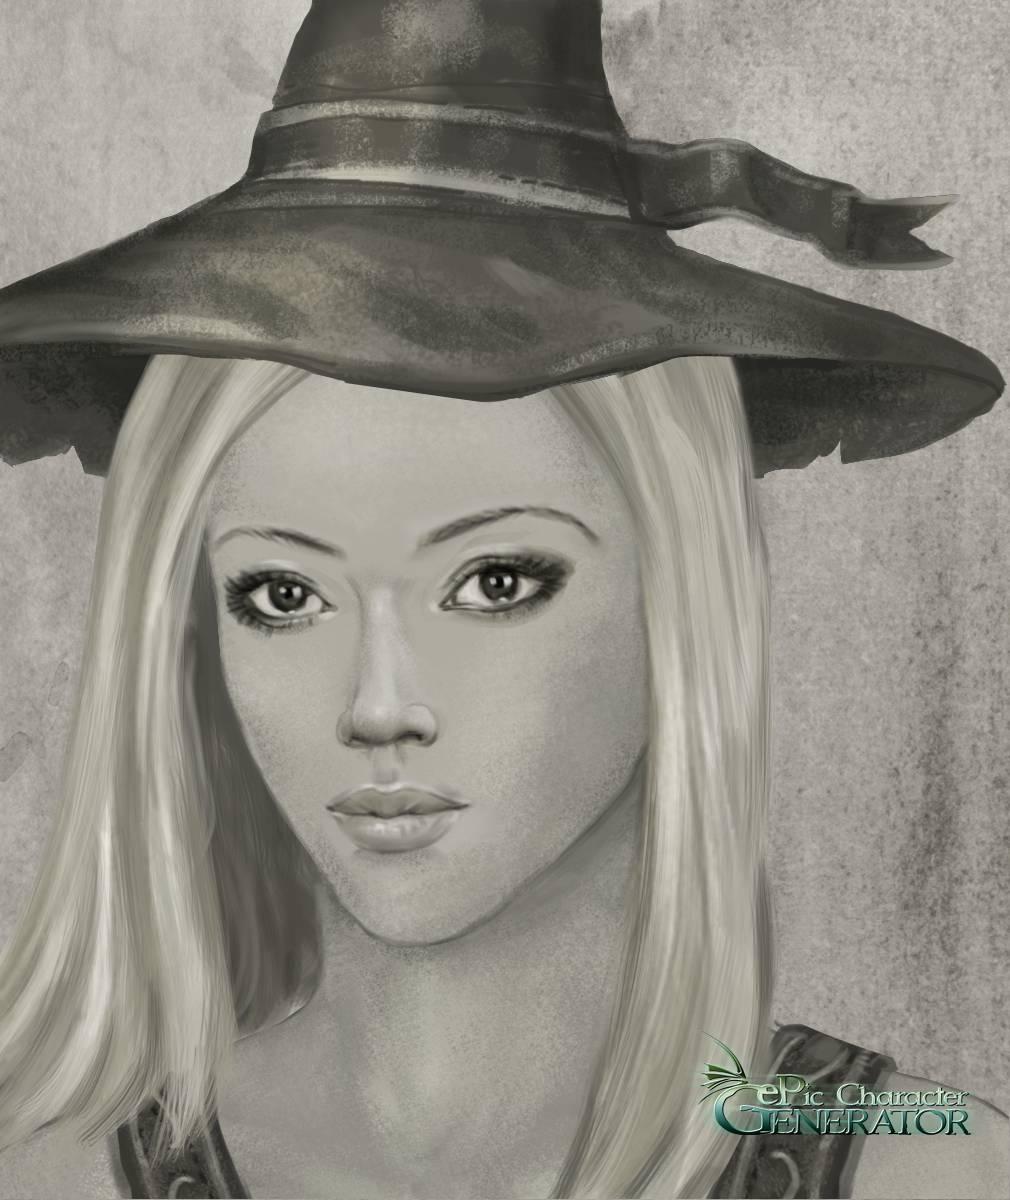 ePic Character Generator Season 3 Female Portrait Screenshot 02